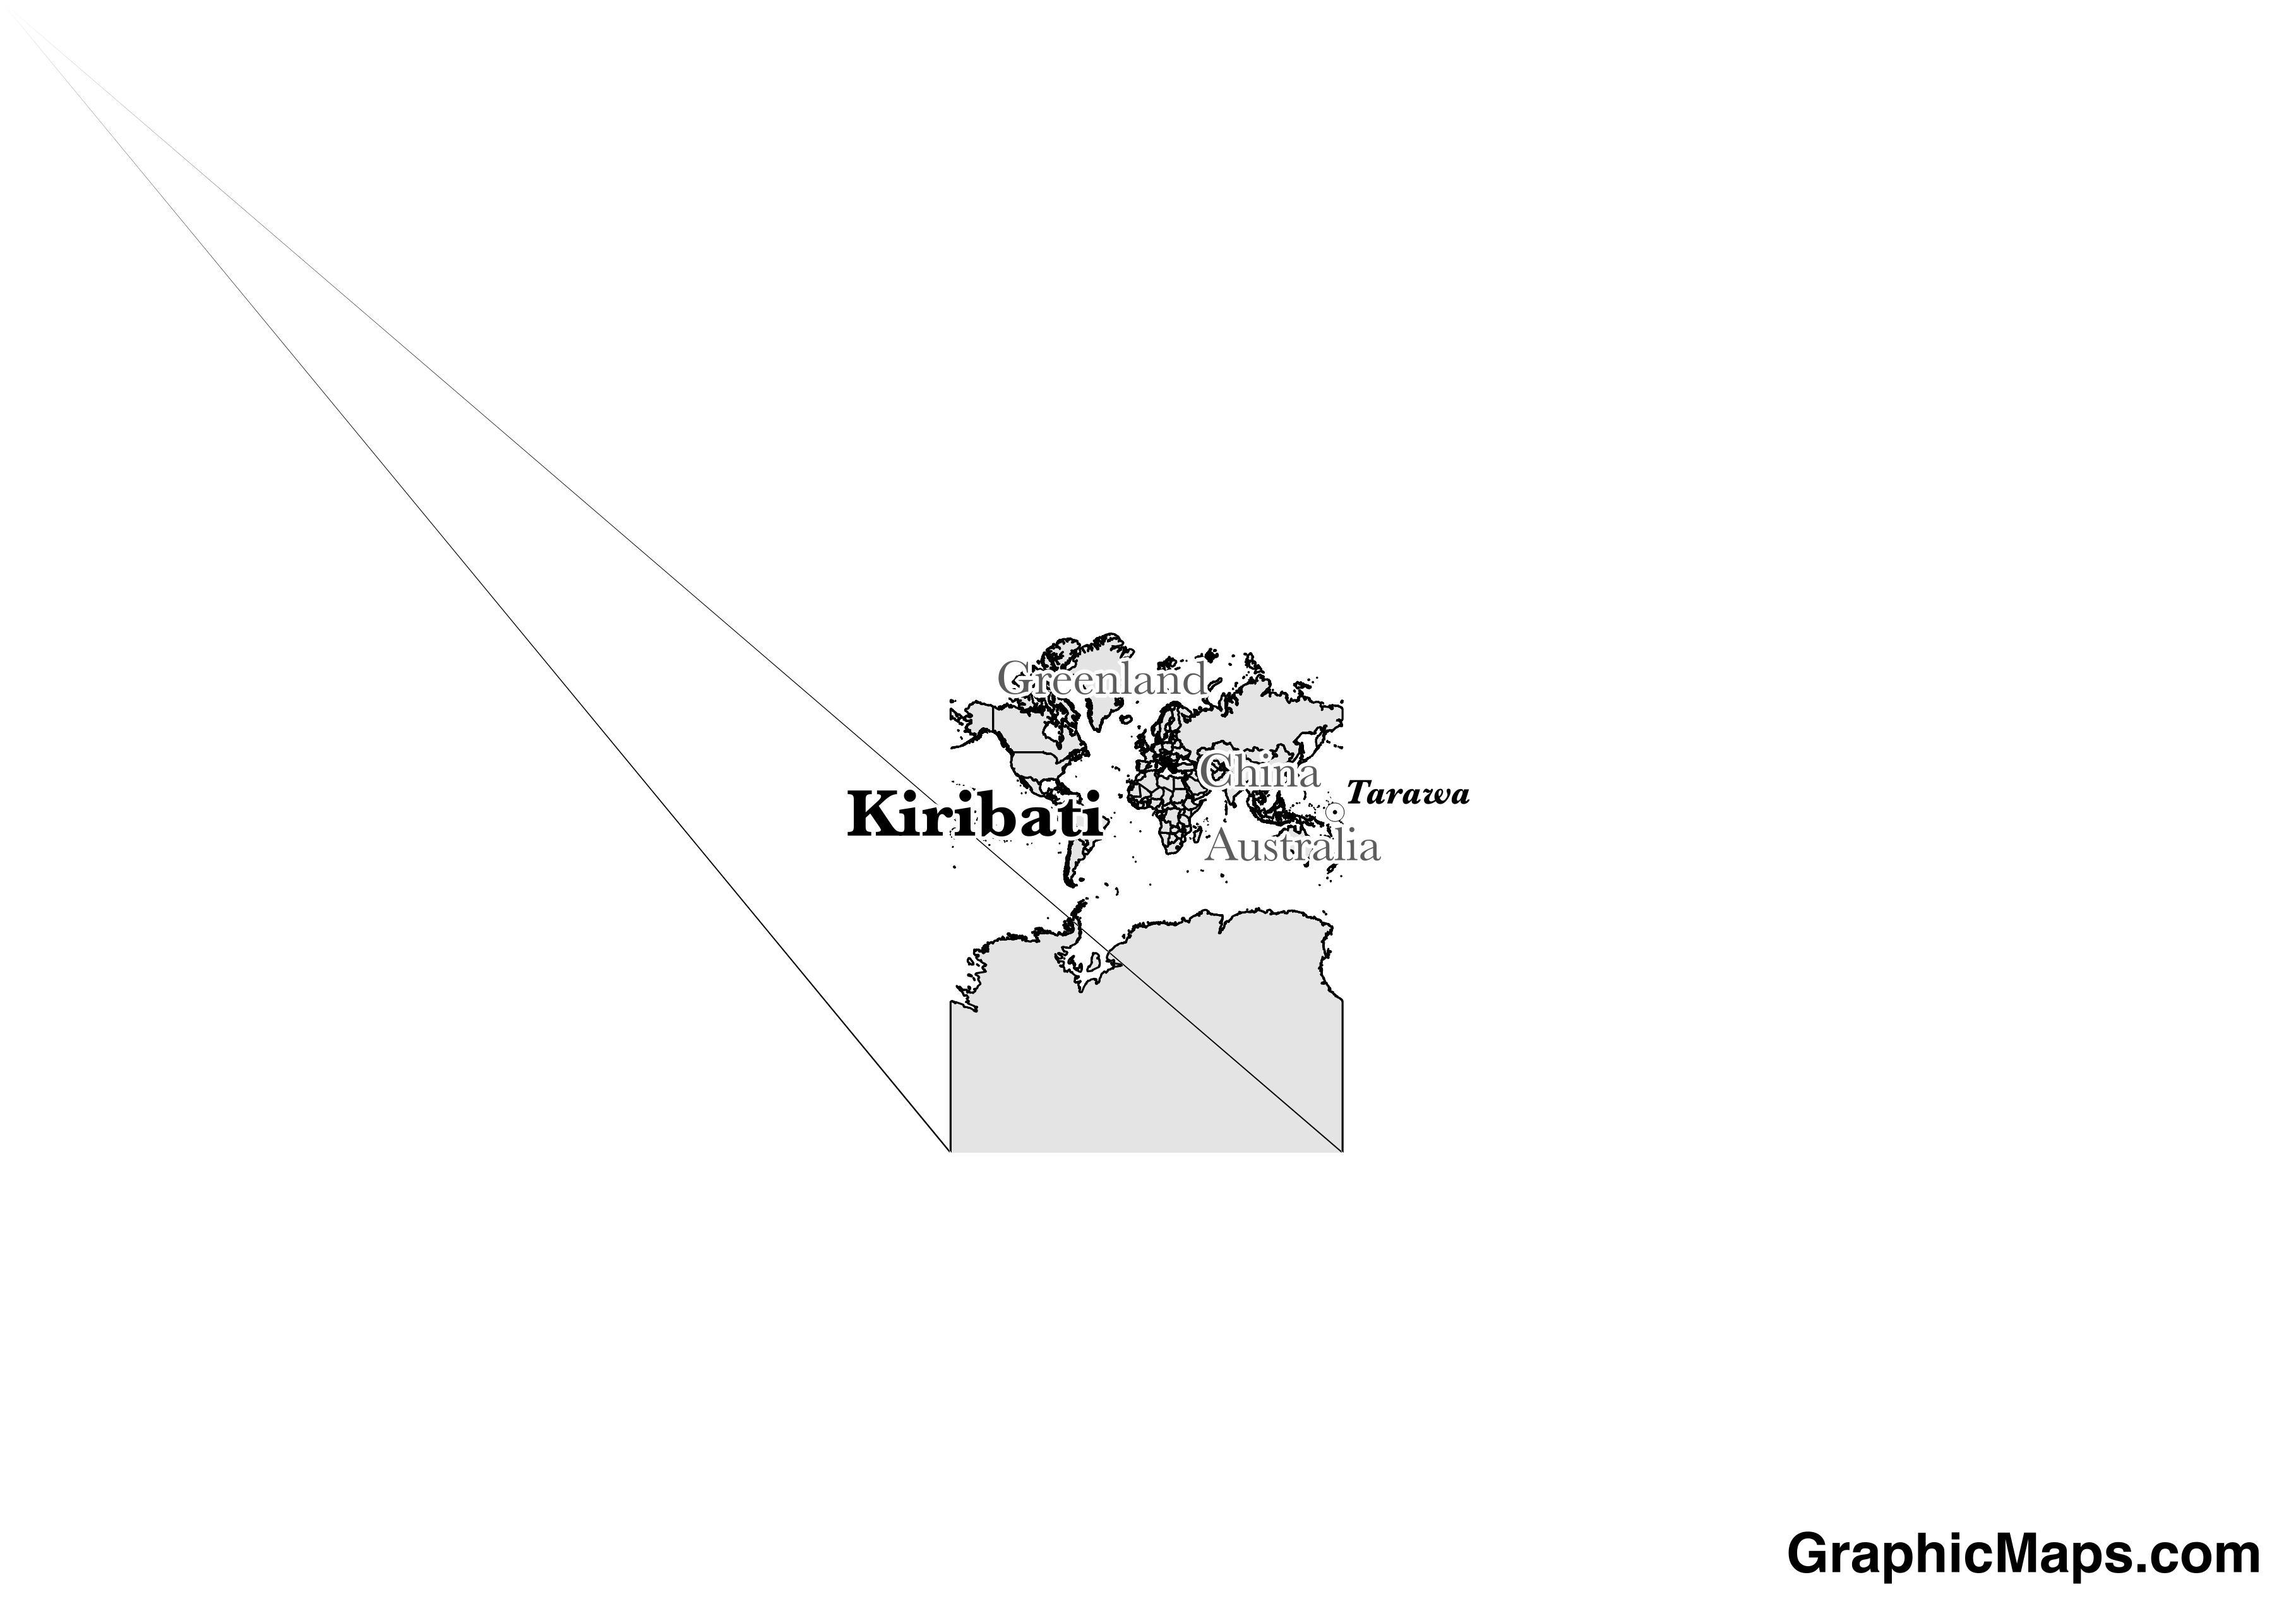 Map showing the location of Kiribati